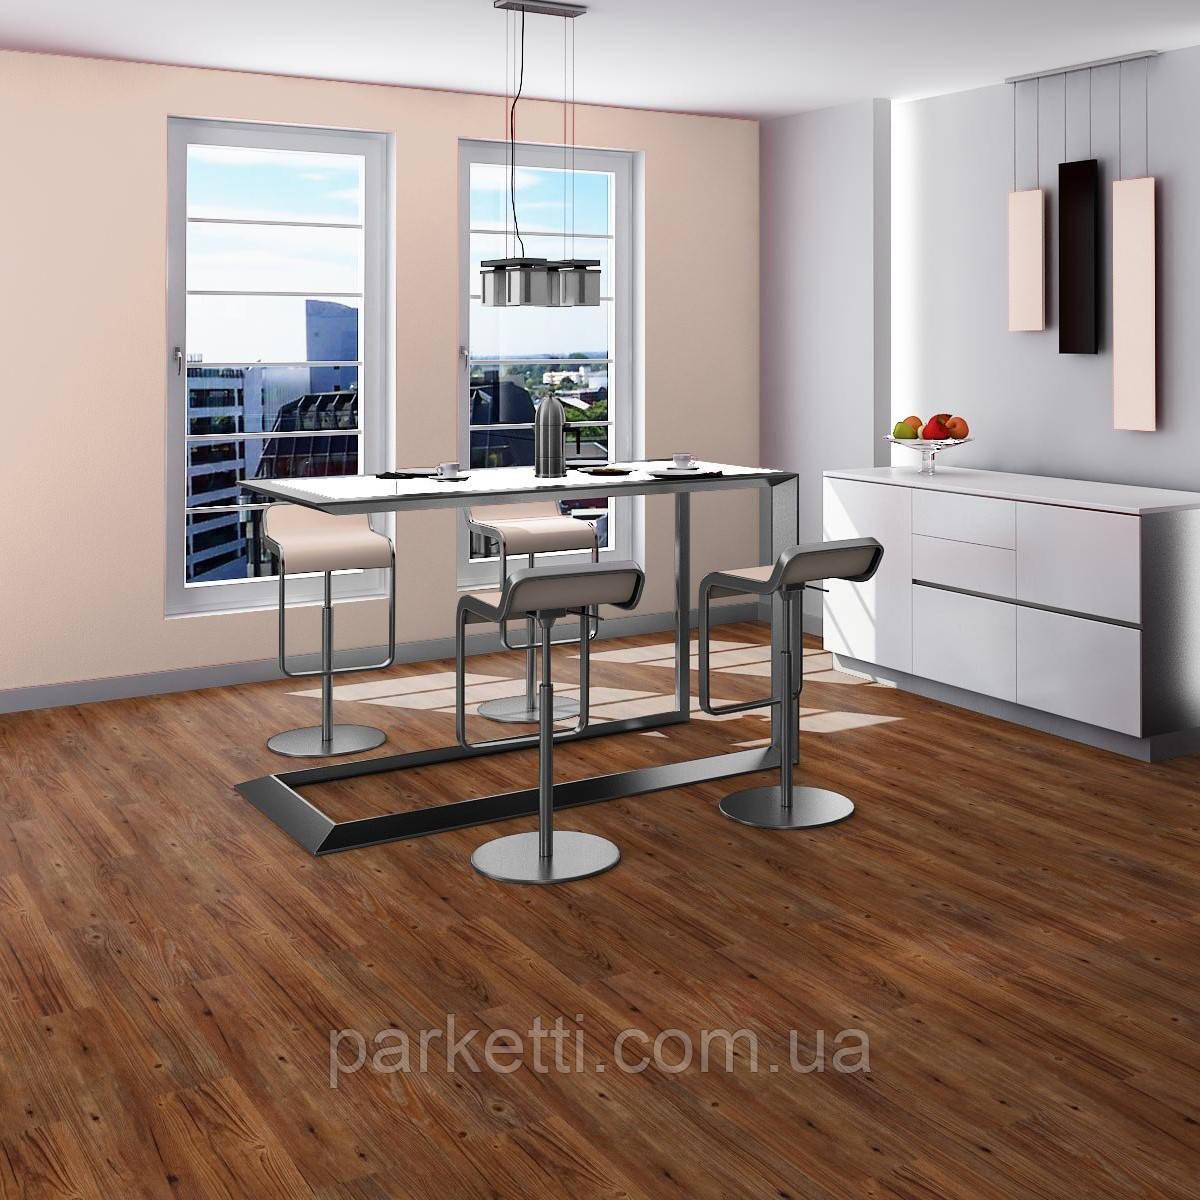 Fatra 10205-1 Thermofix Wood Каштан (Chestnut) виниловая плитка, 2.0 мм, фото 1